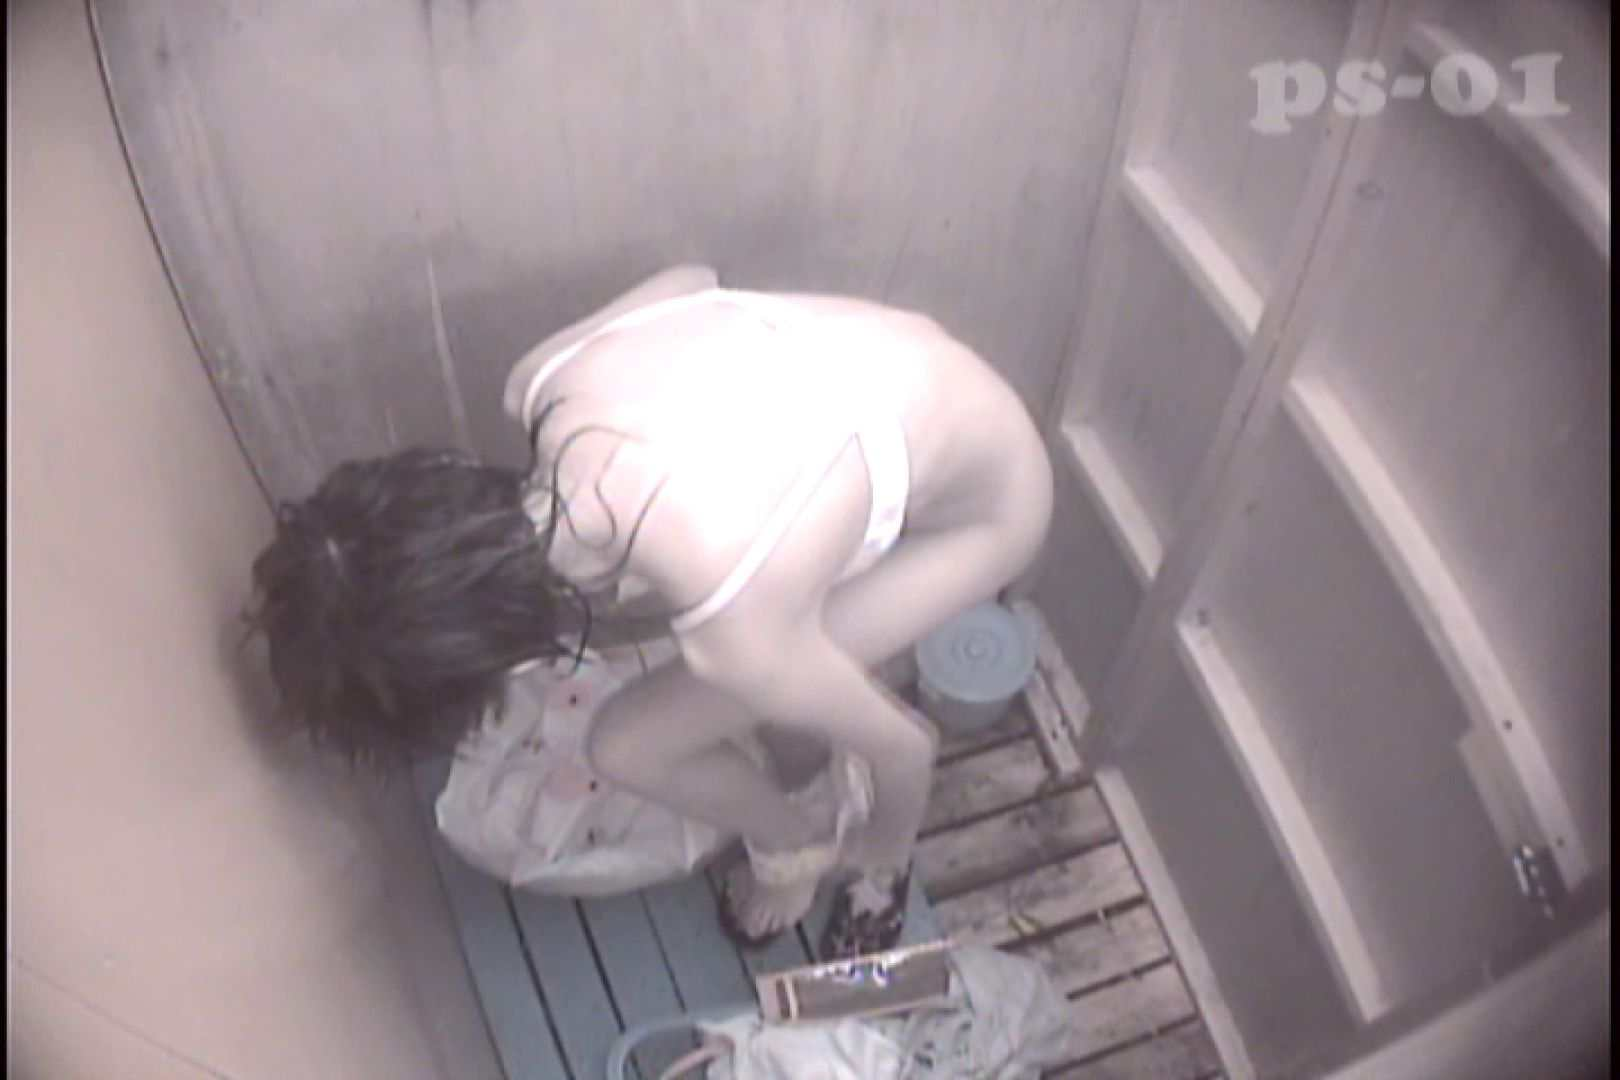 File.02 貧乳と下着がナイス! シャワー エロ画像 69画像 45